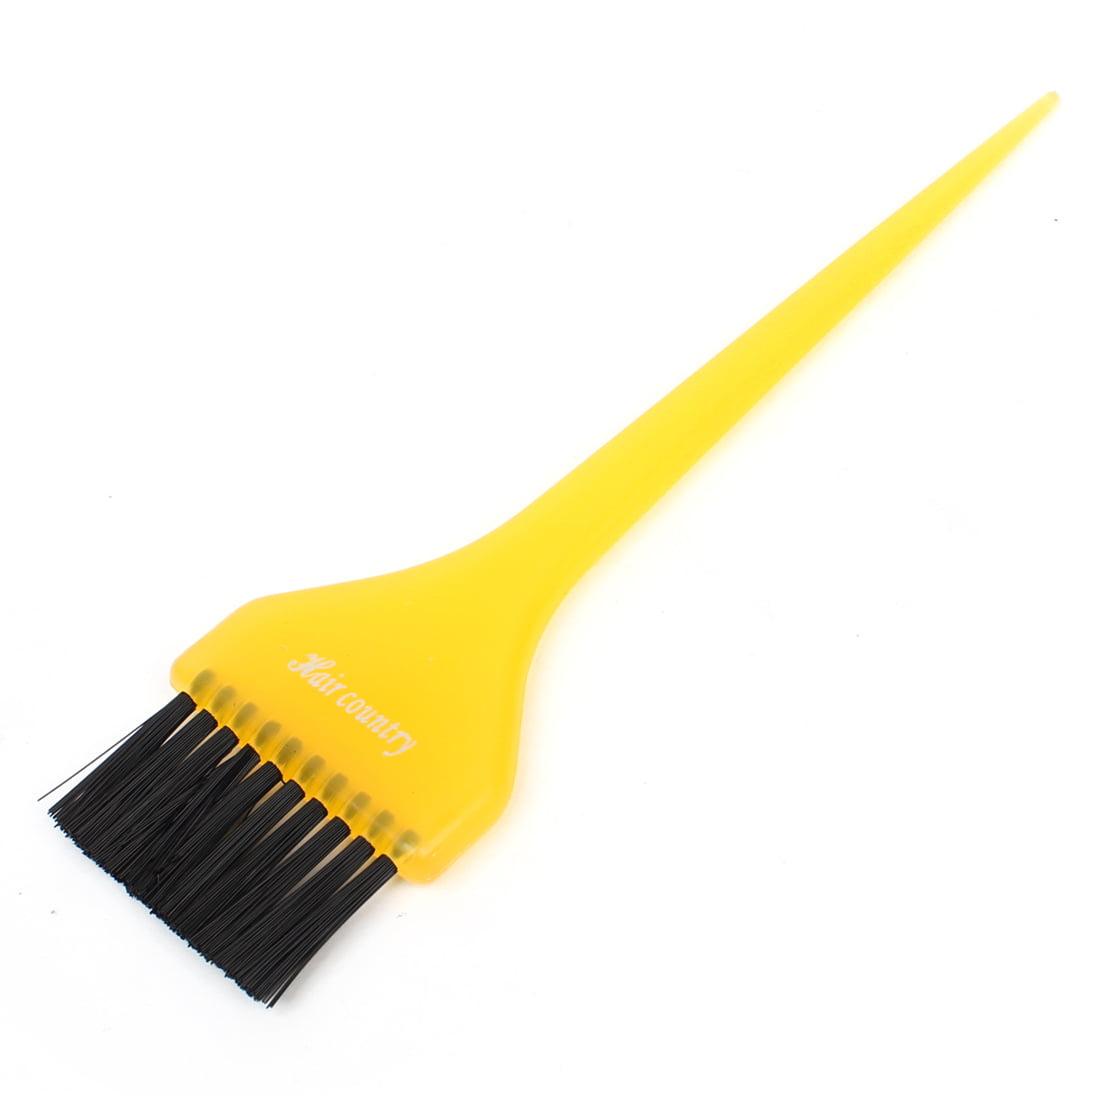 Barbershop Yellow Plastic Grip Hair Dyeing Coloring Brush 8 6 Long